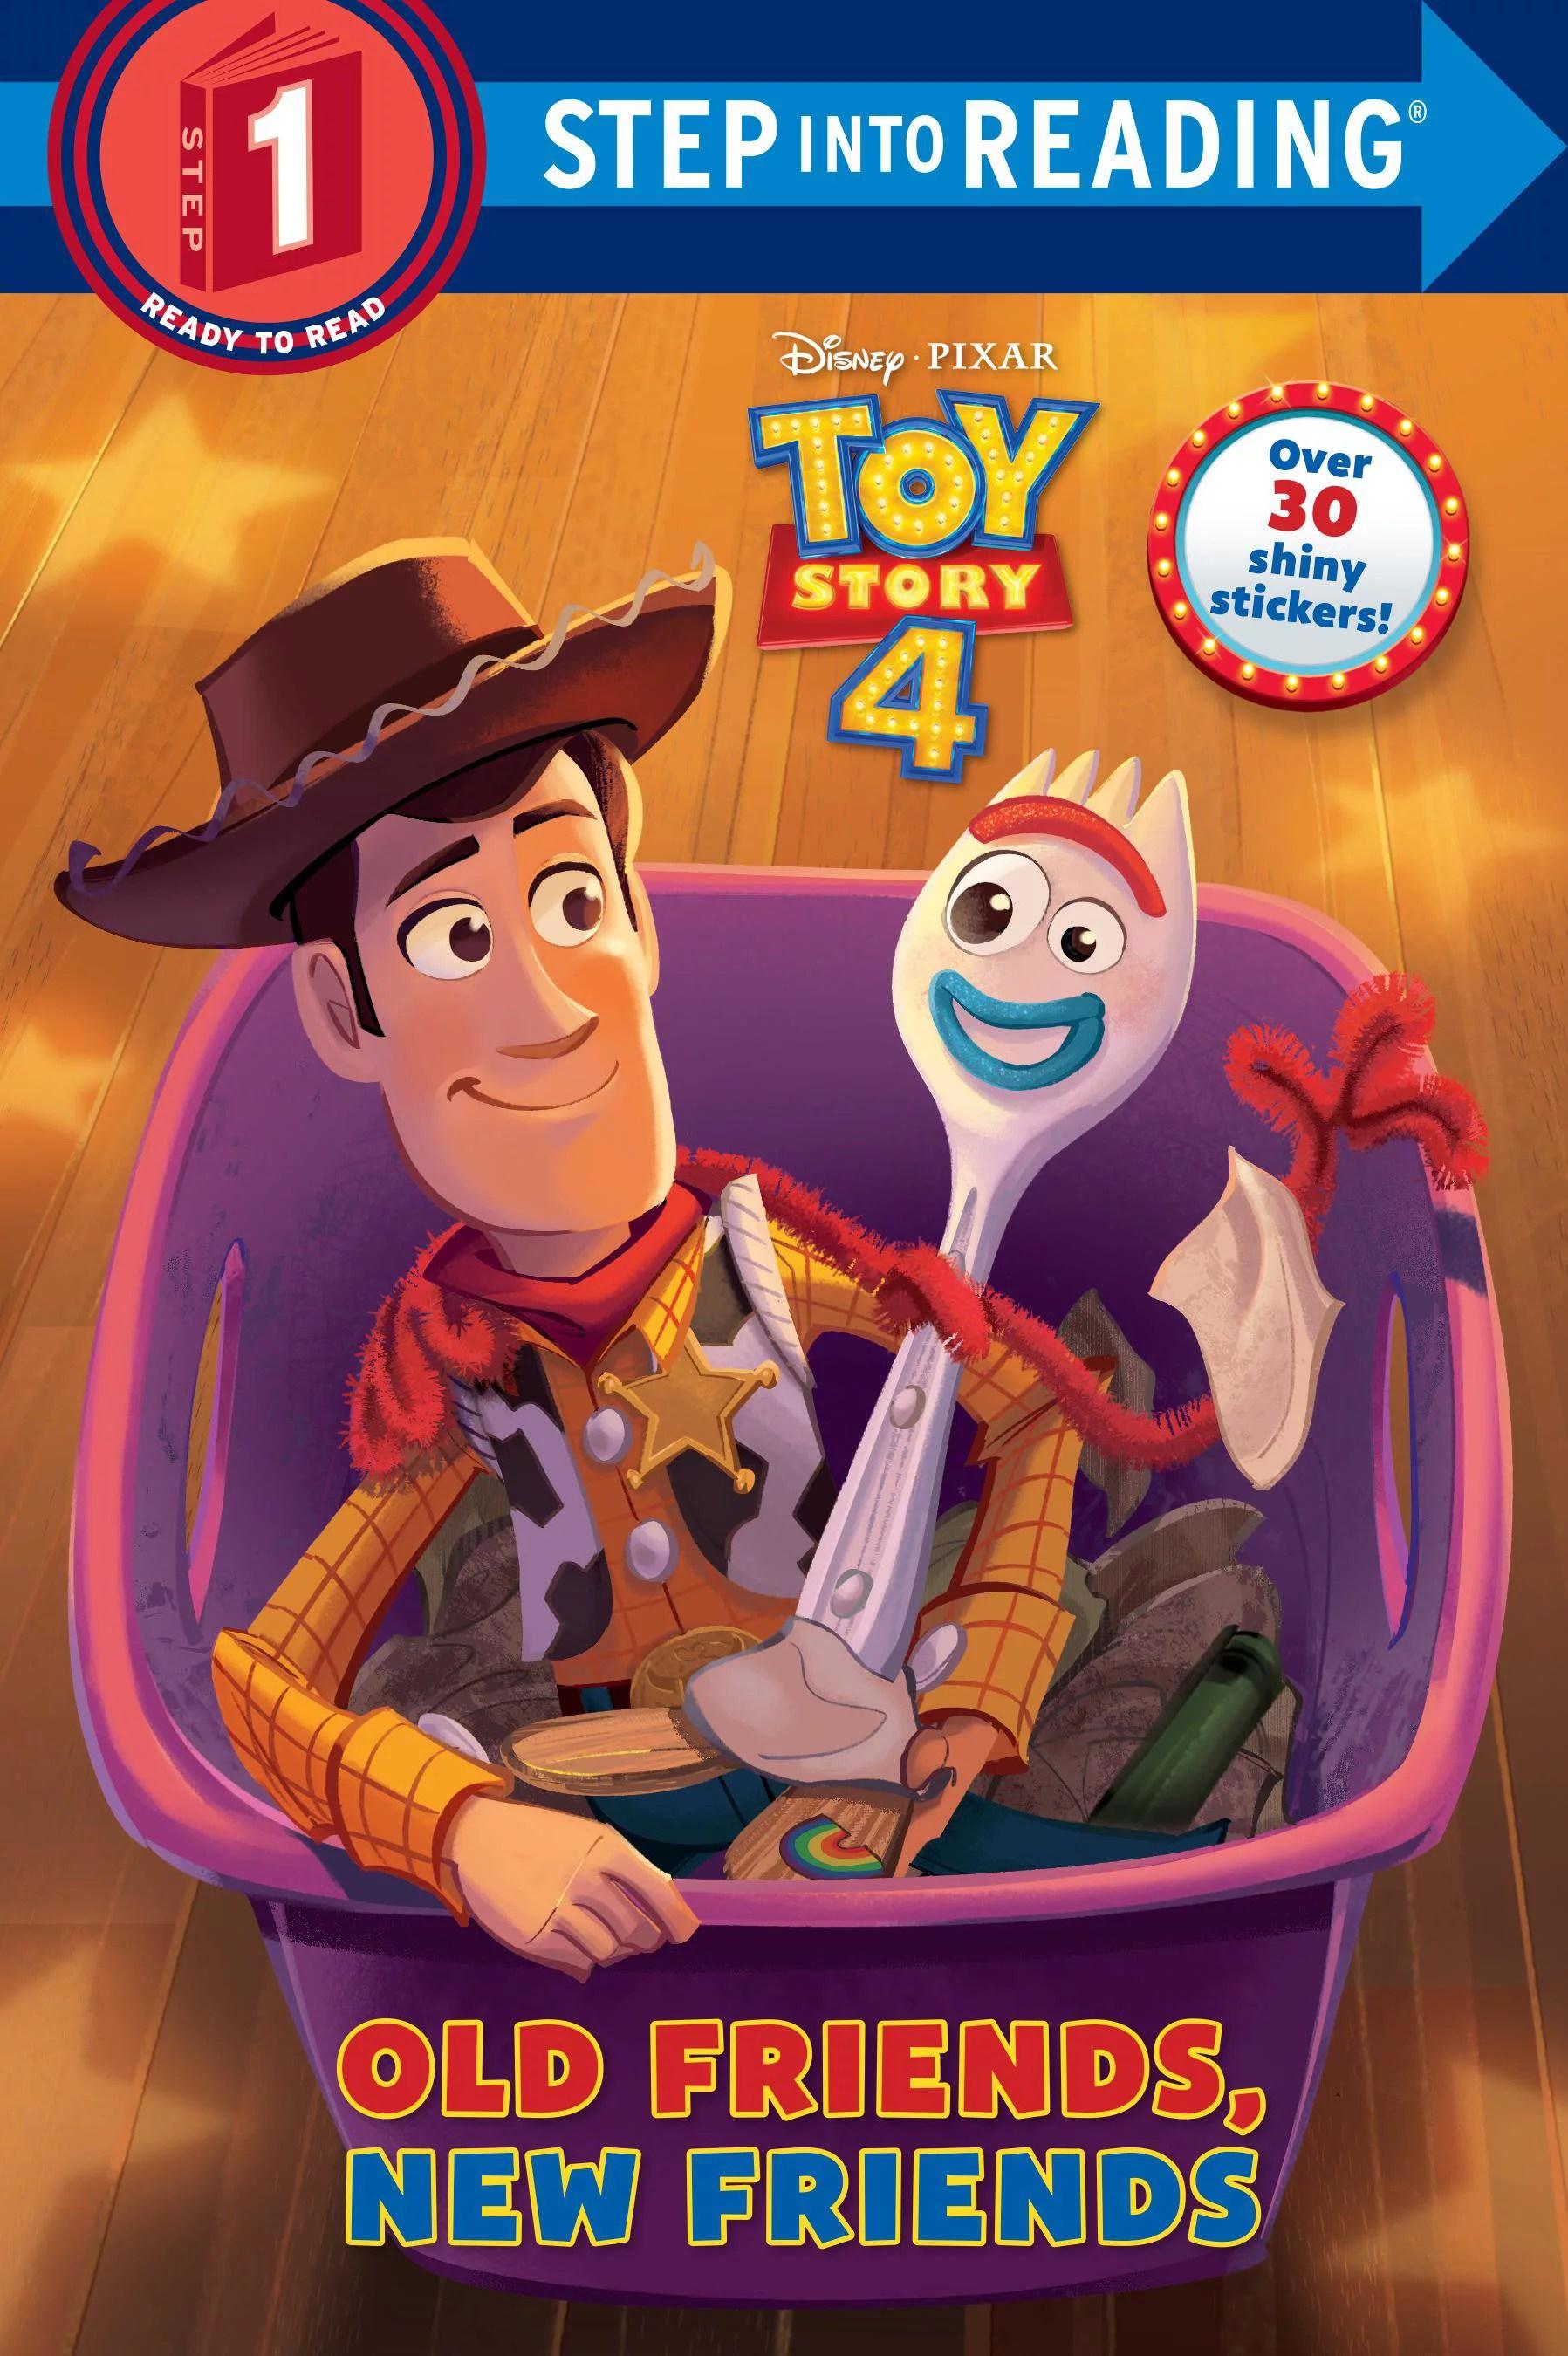 Old Friends New Friends Disney Pixar Toy Story 4